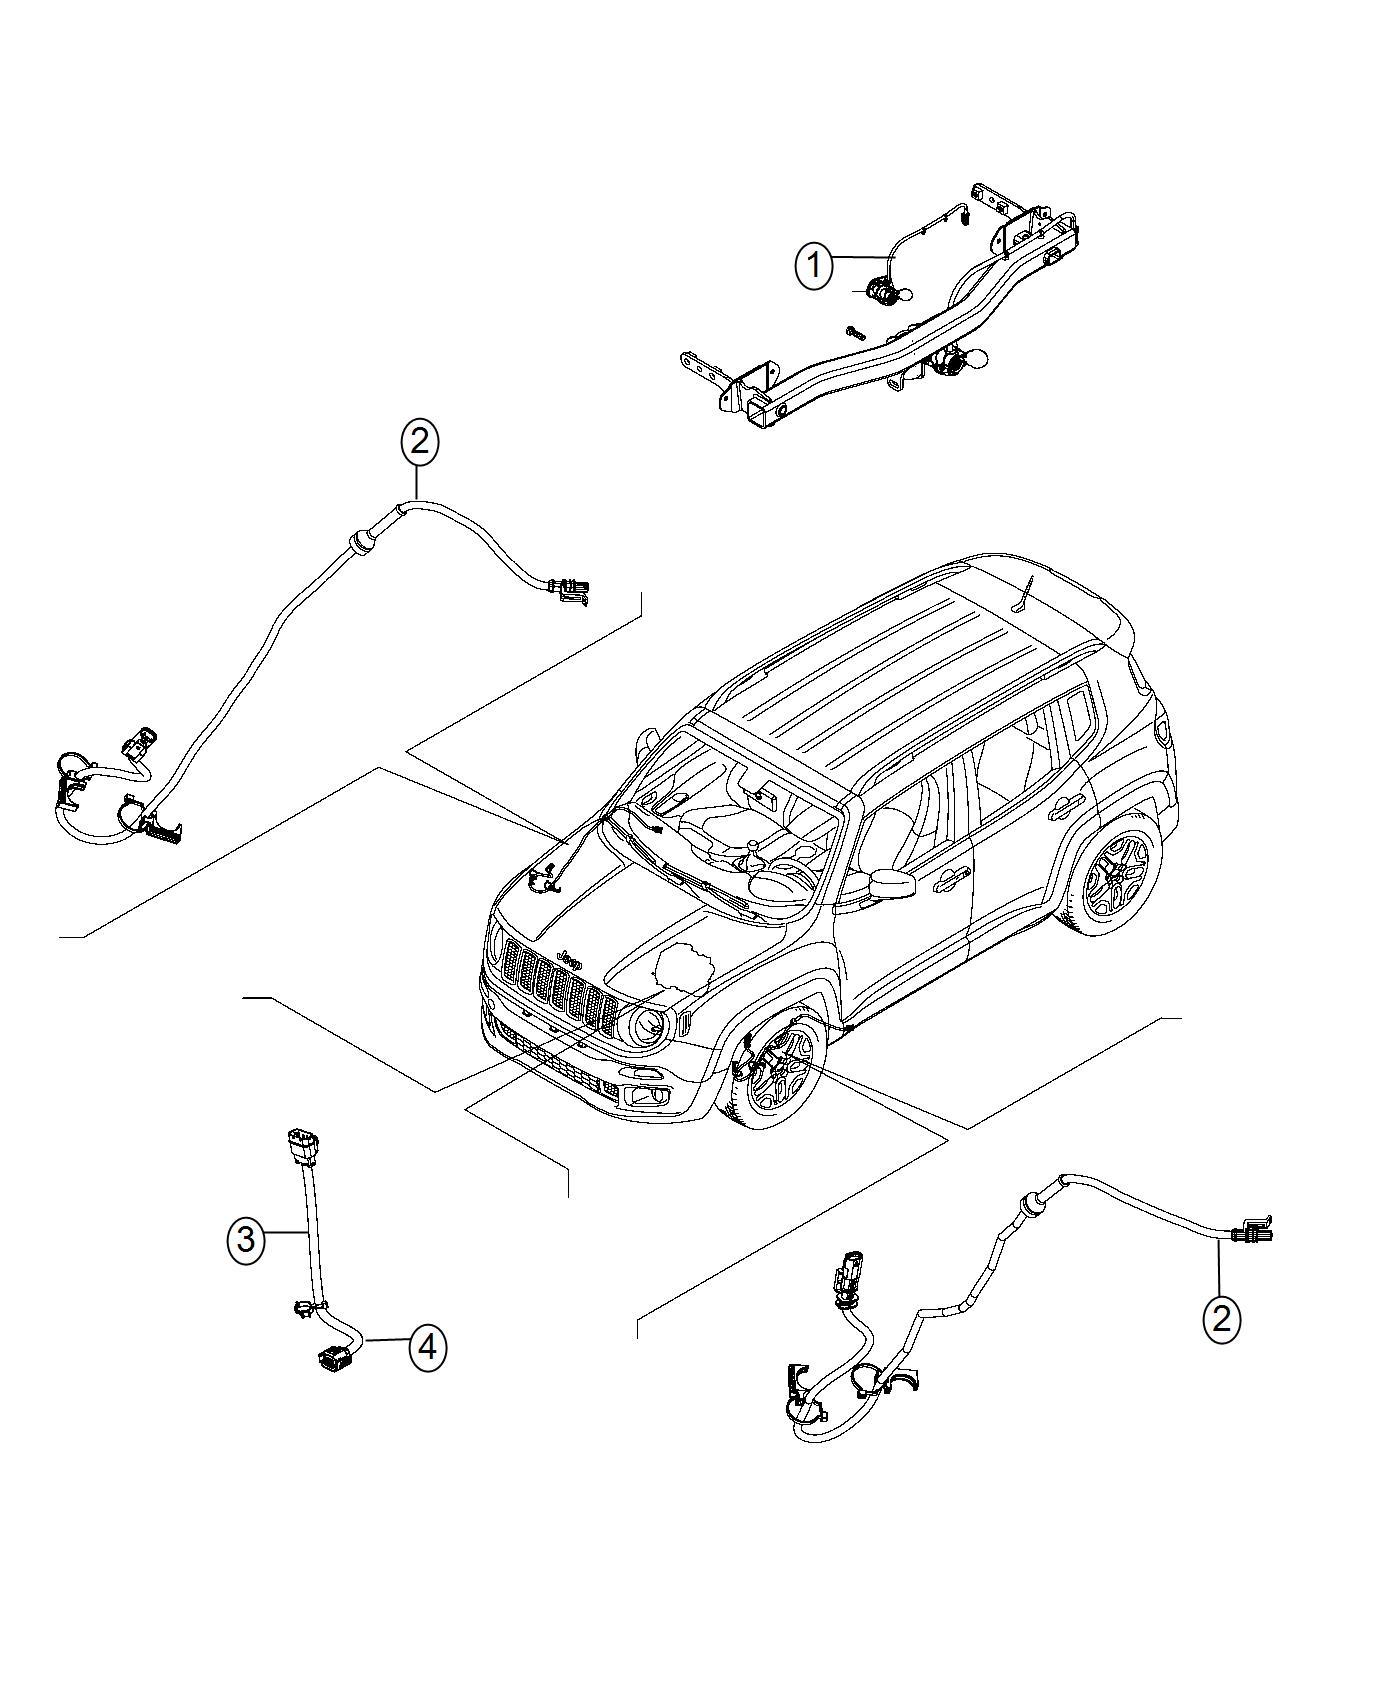 Jeep Renegade Wiring. Jumper, transmission. Export, us